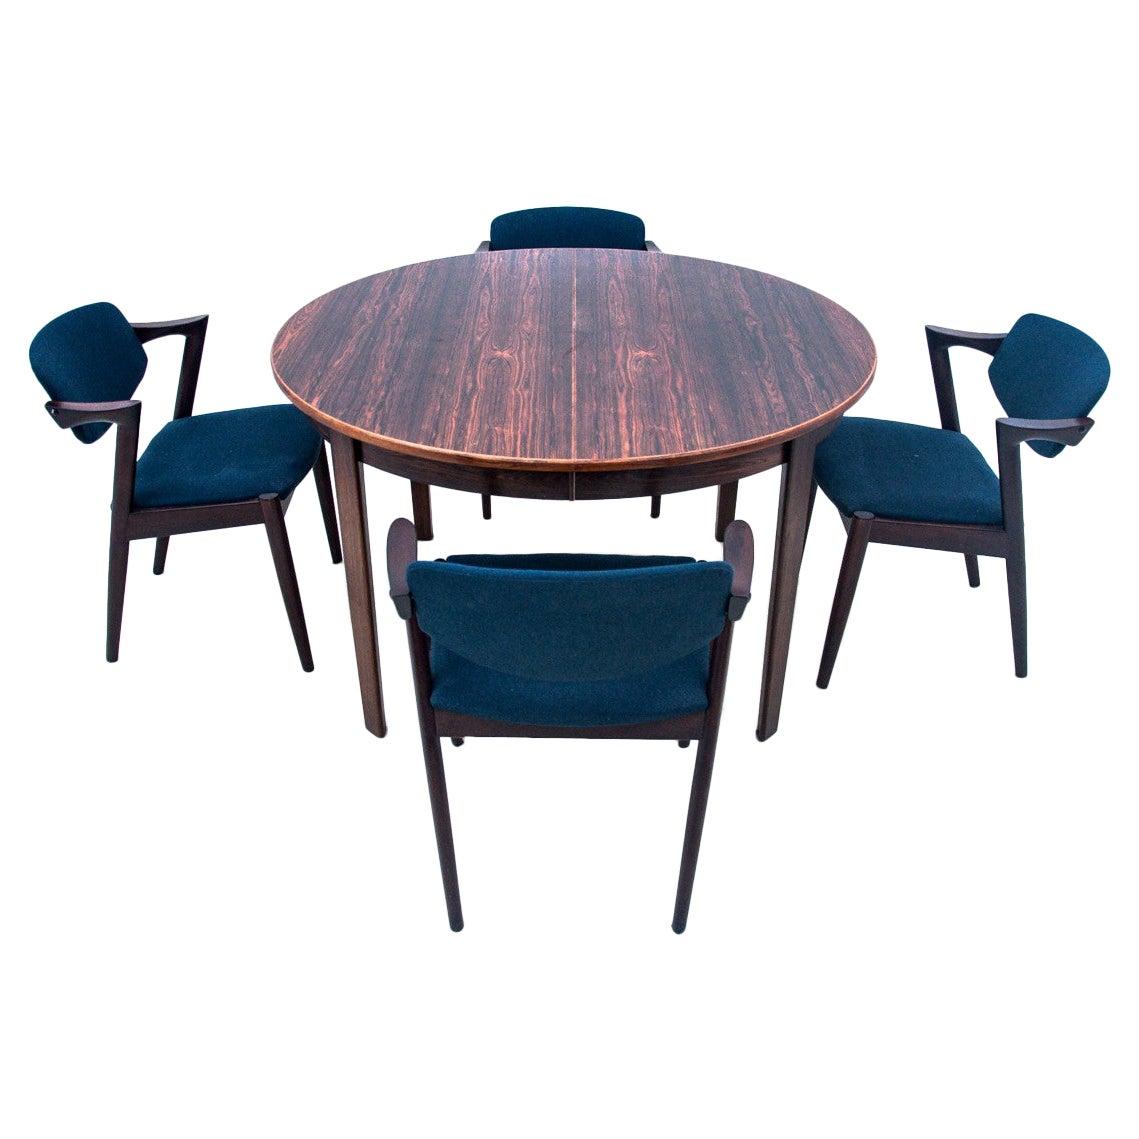 Dining Set, Designed by Kai Kristiansen, Danish Design, 1960s